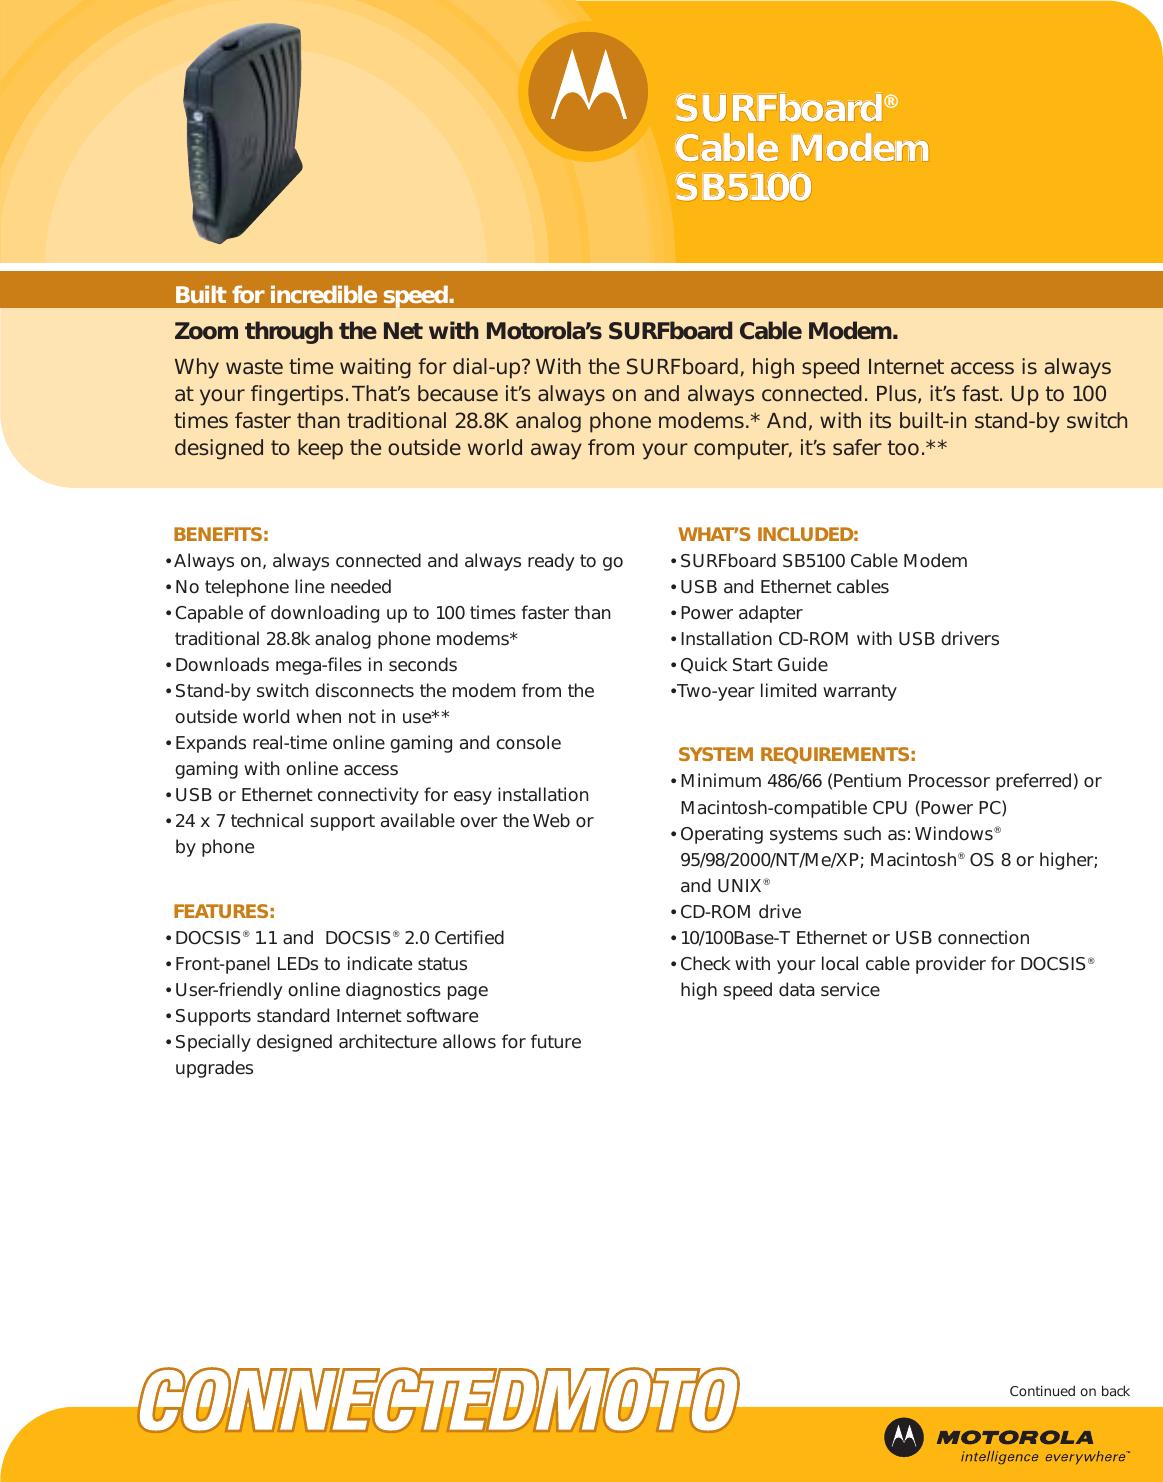 Motorola surfboard sb5100 download user guide for free 3e6a8.